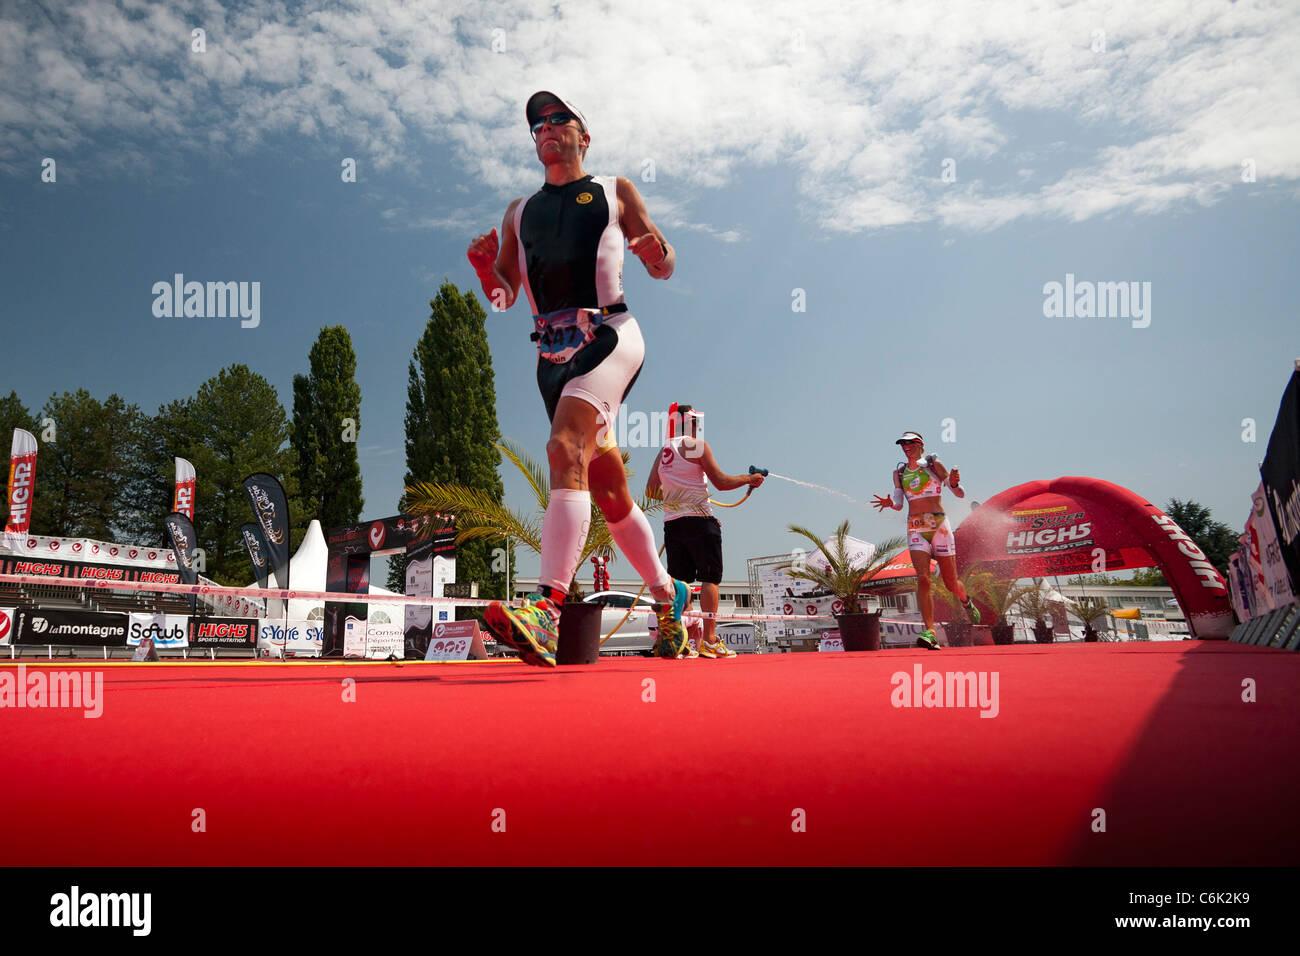 The Vichy long distance Triathlon race (Allier - France). Triathlon longue distance de type Ironman, à Vichy - Stock Image